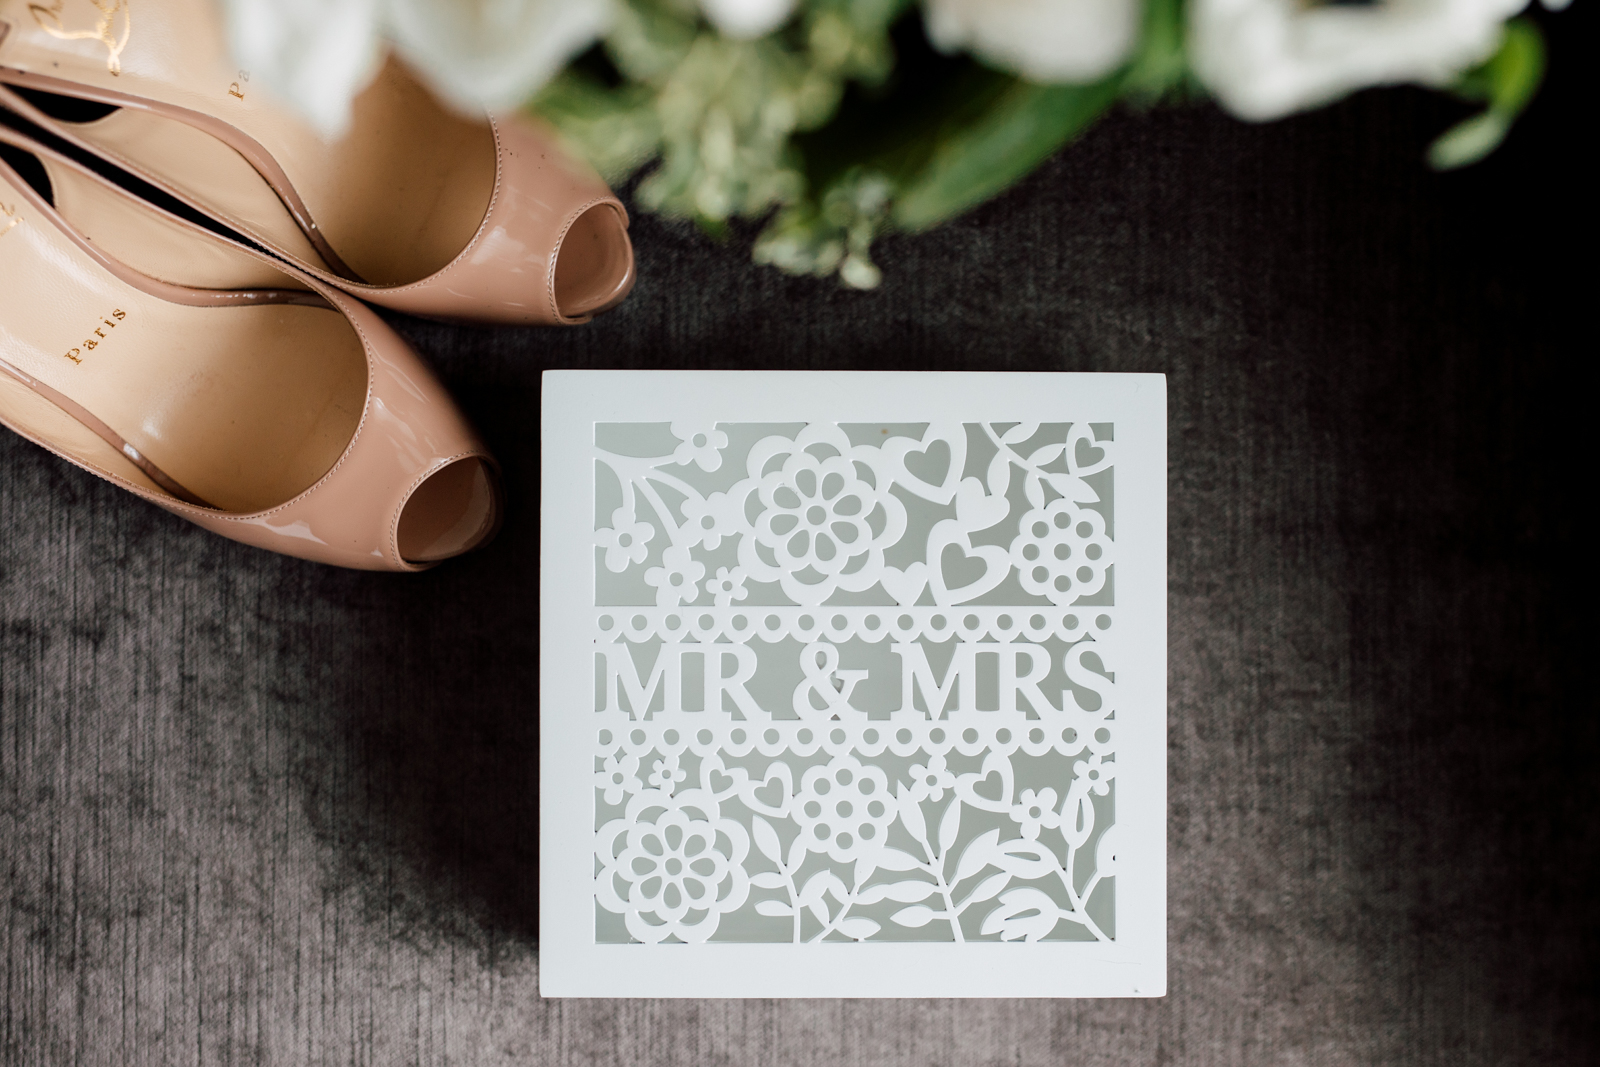 mr & mrs box